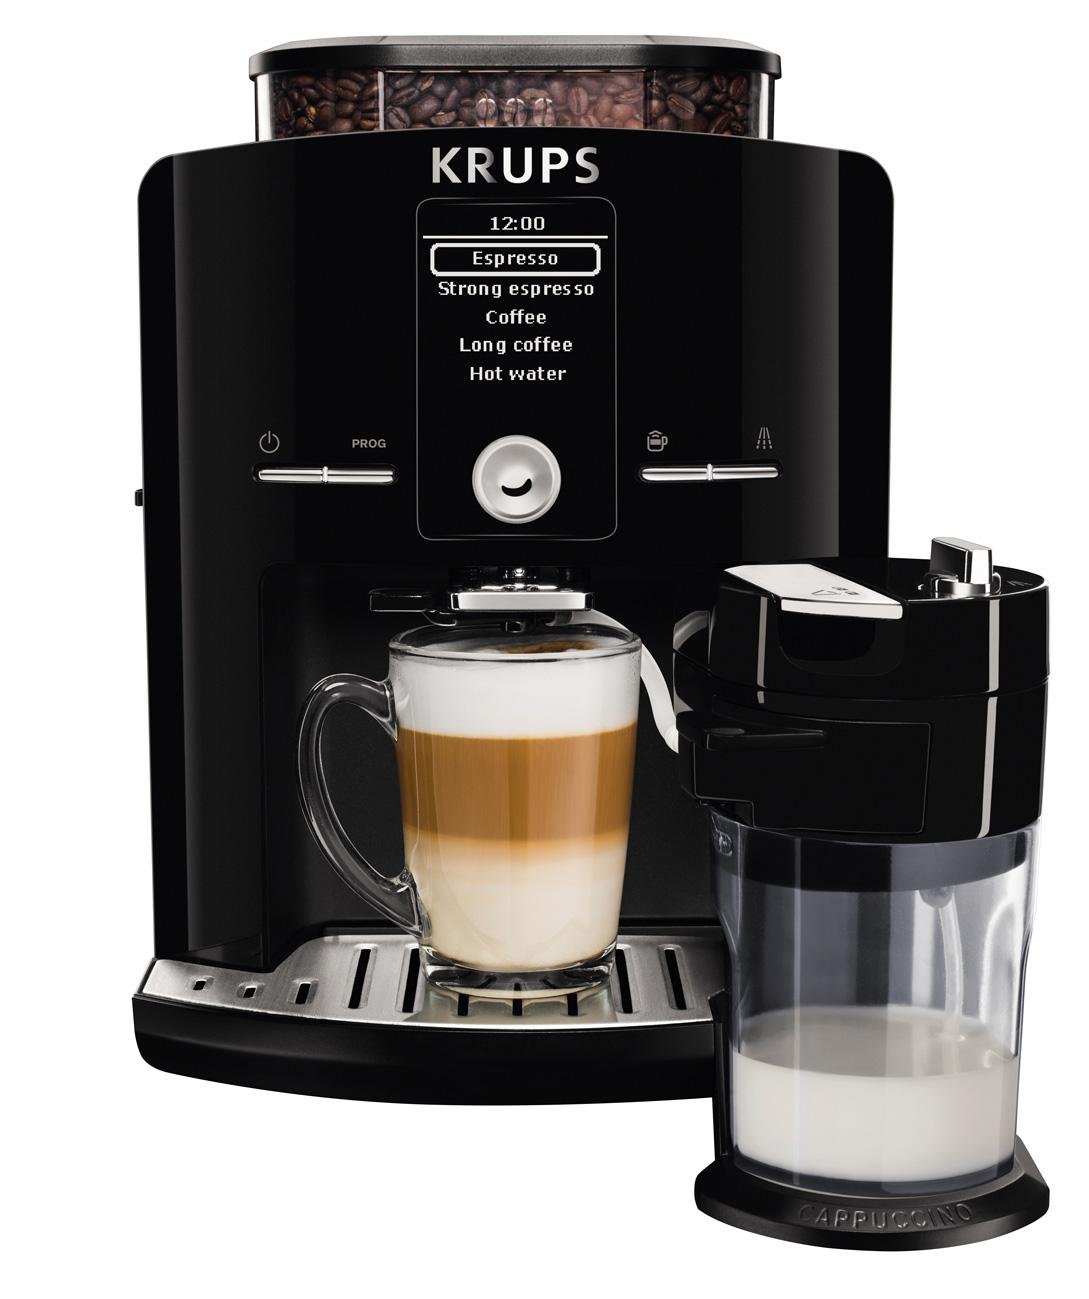 krups kaffeevollautomat latt espress ea8298 im kompaktformat. Black Bedroom Furniture Sets. Home Design Ideas